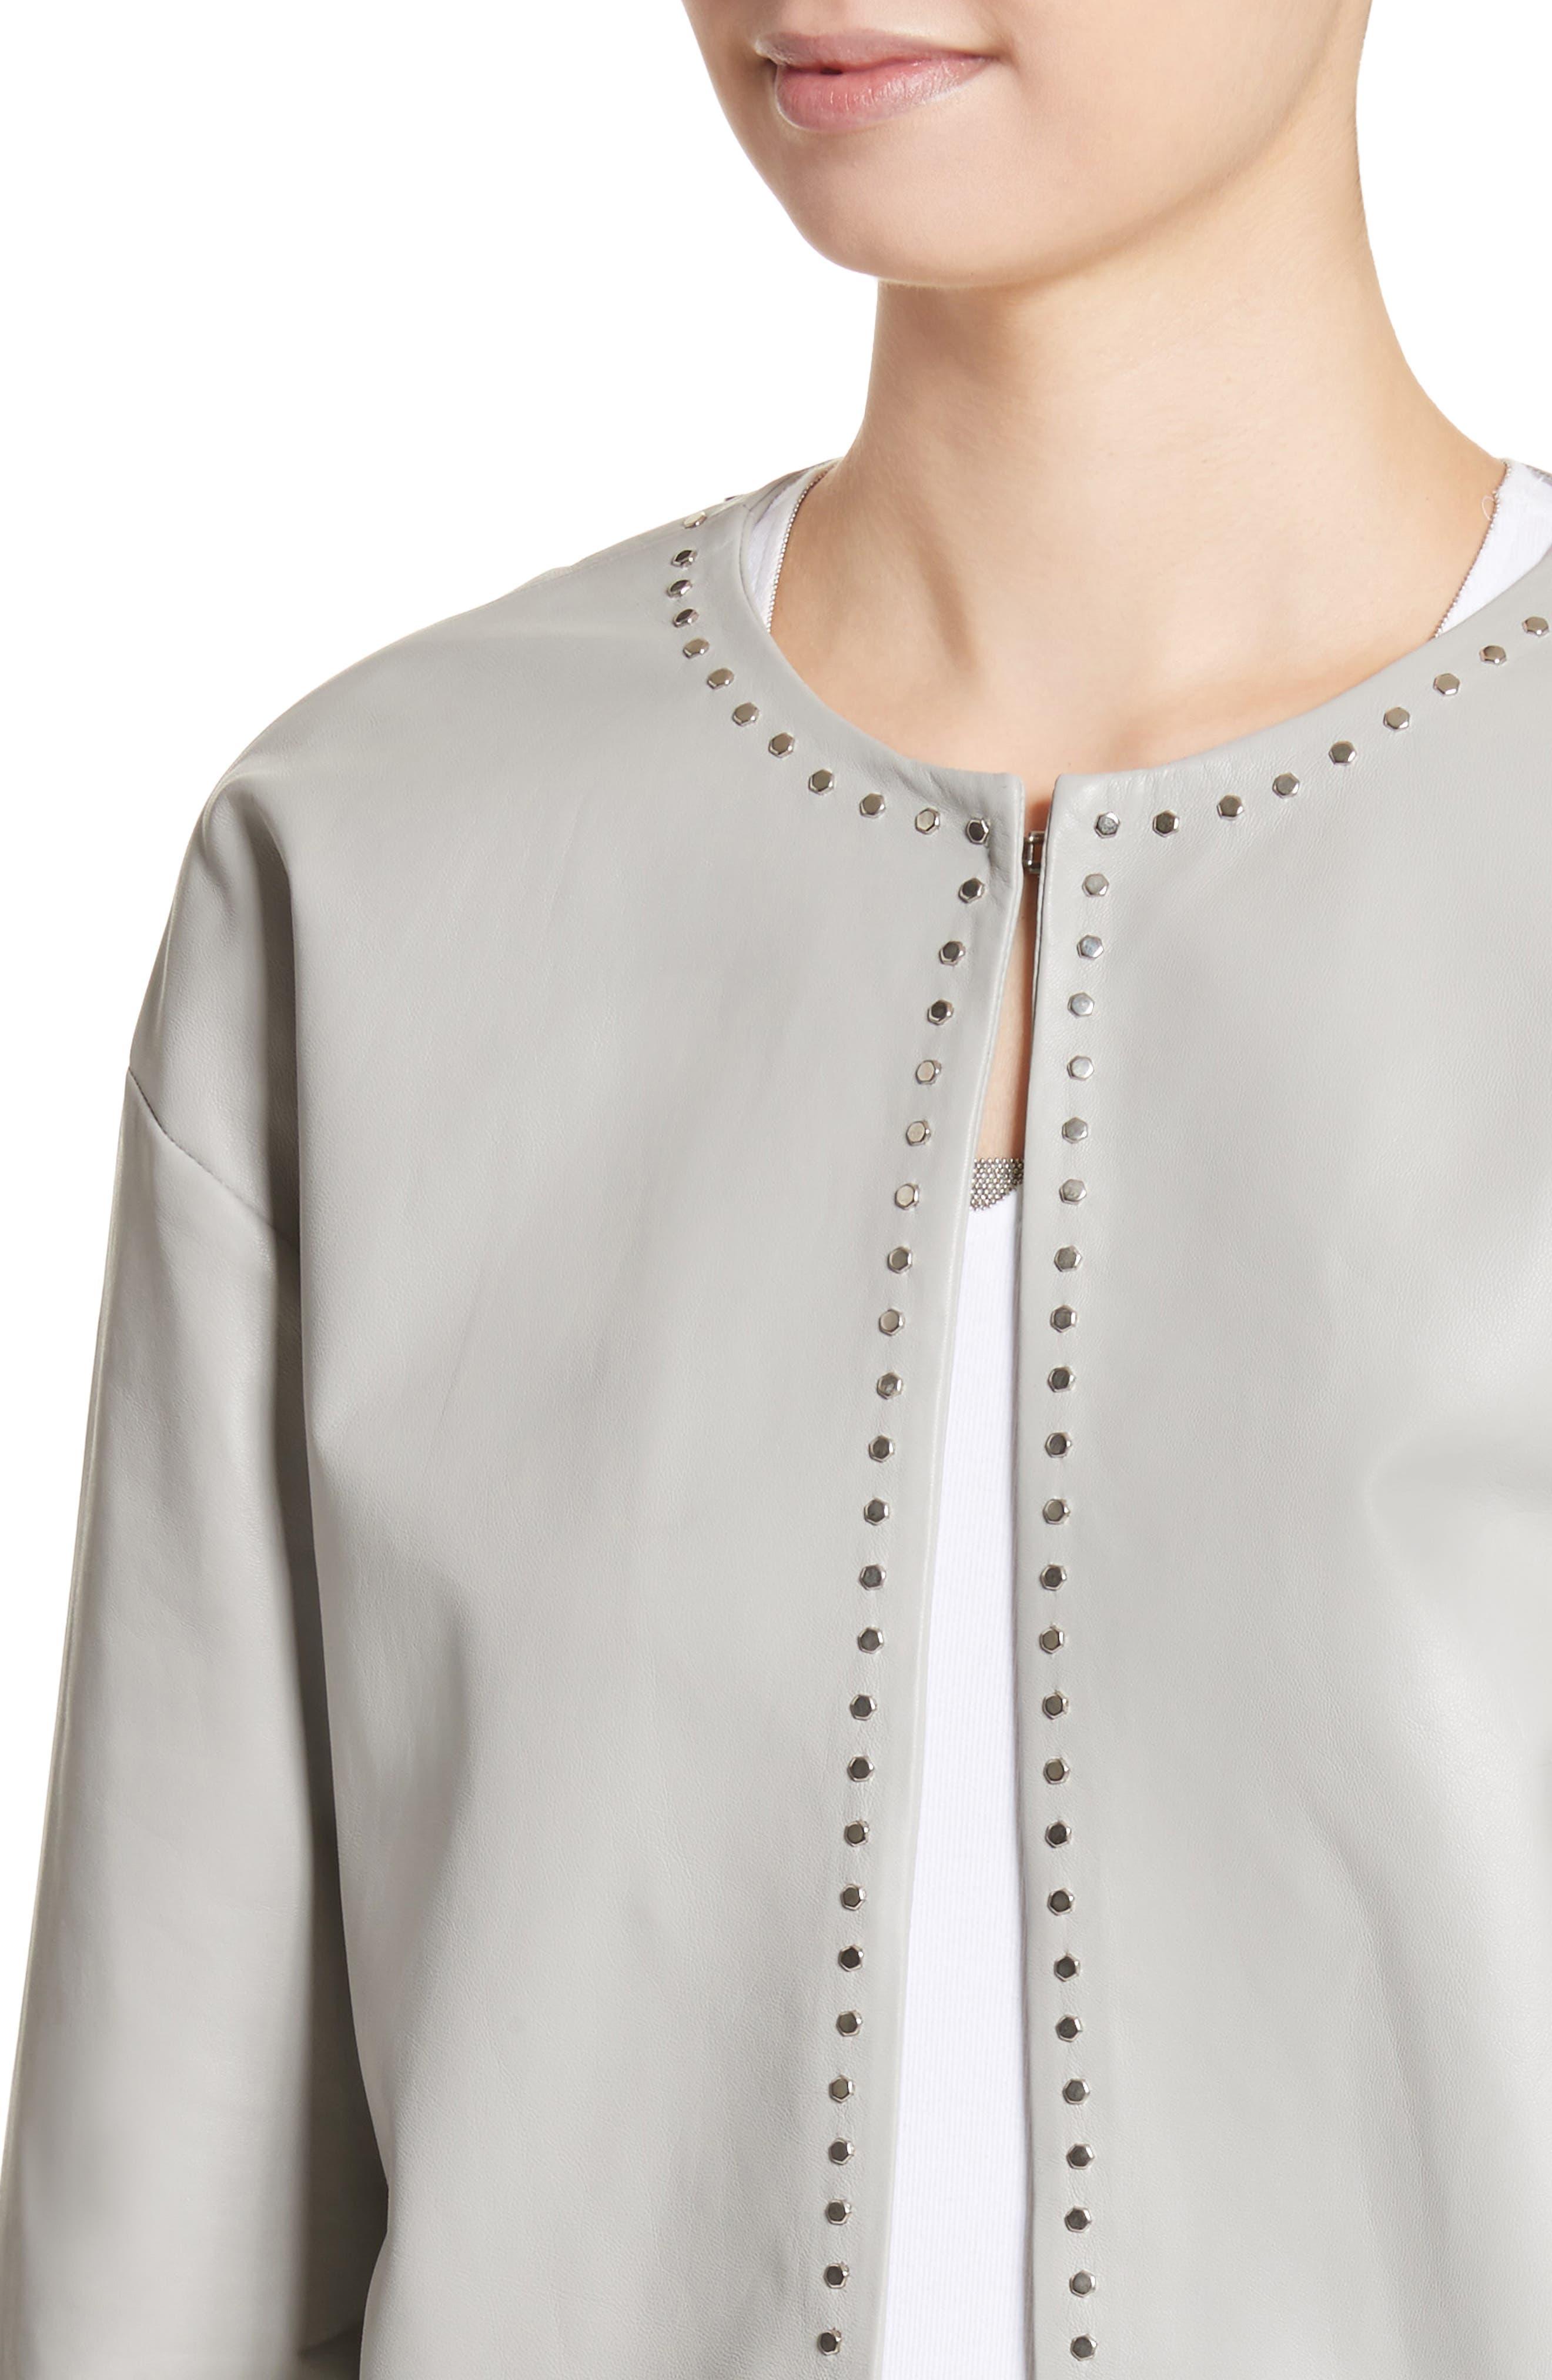 Studded Nappa Leather Jacket,                             Alternate thumbnail 4, color,                             Grey